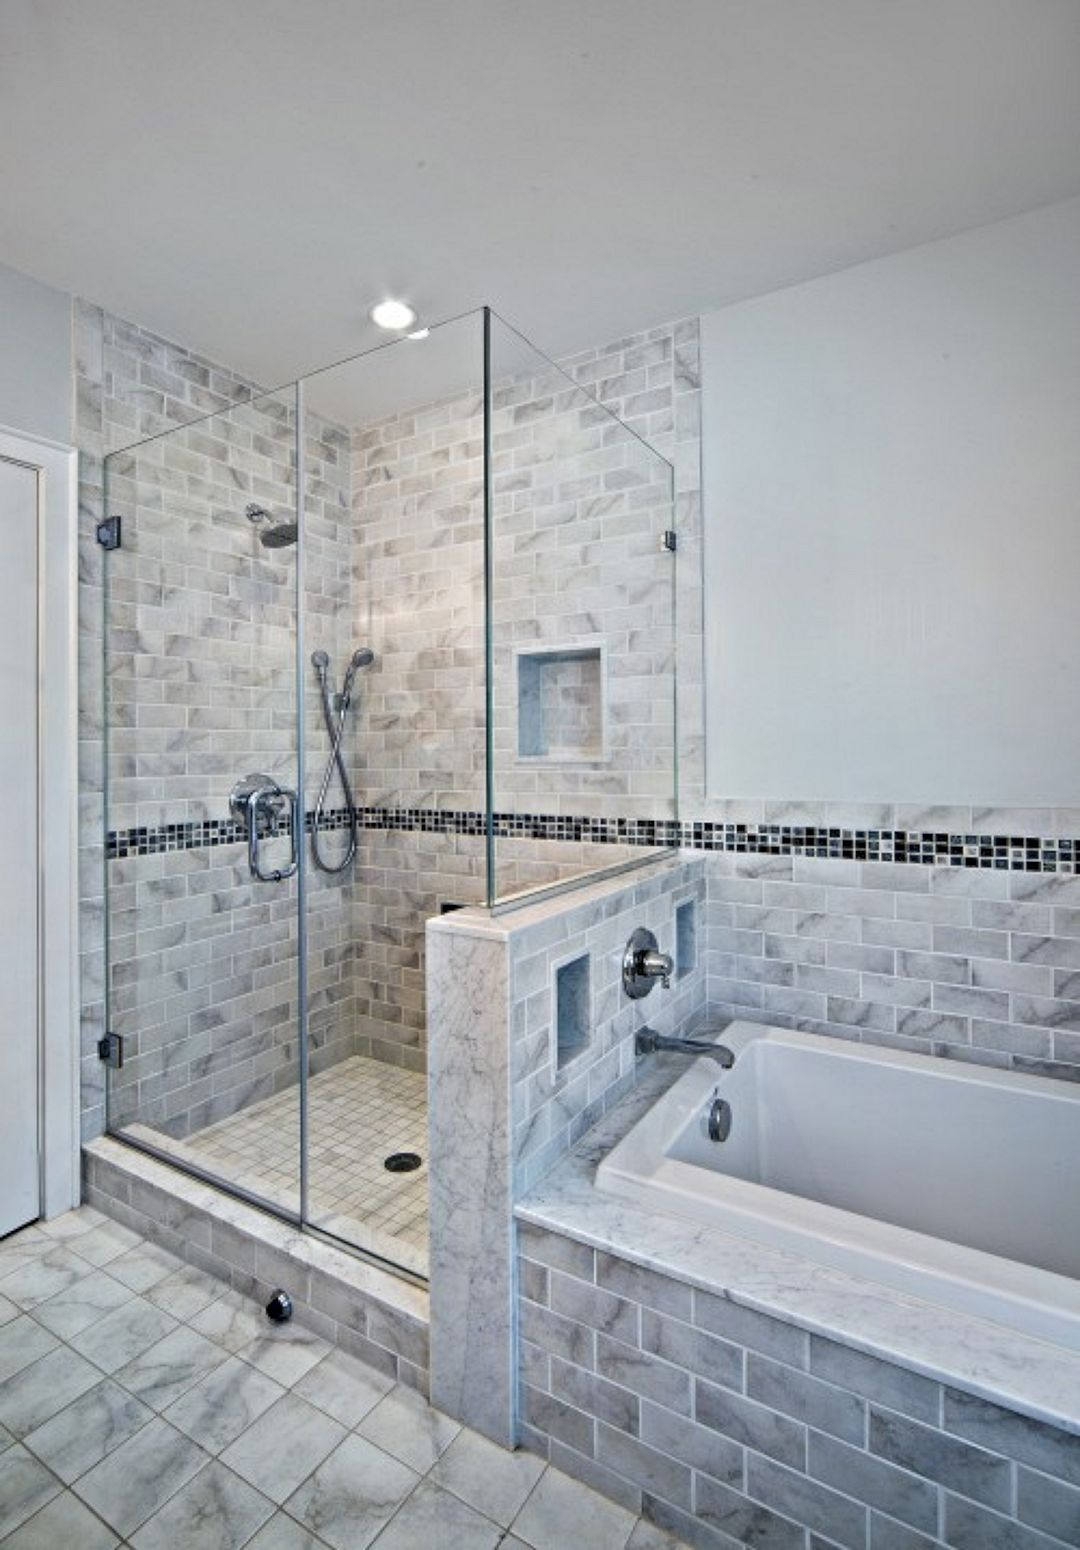 10 Wonderful Diy Master Bathroom Ideas Remodel On A Budget In 2020 Koupelna Interiery Mala Koupelna